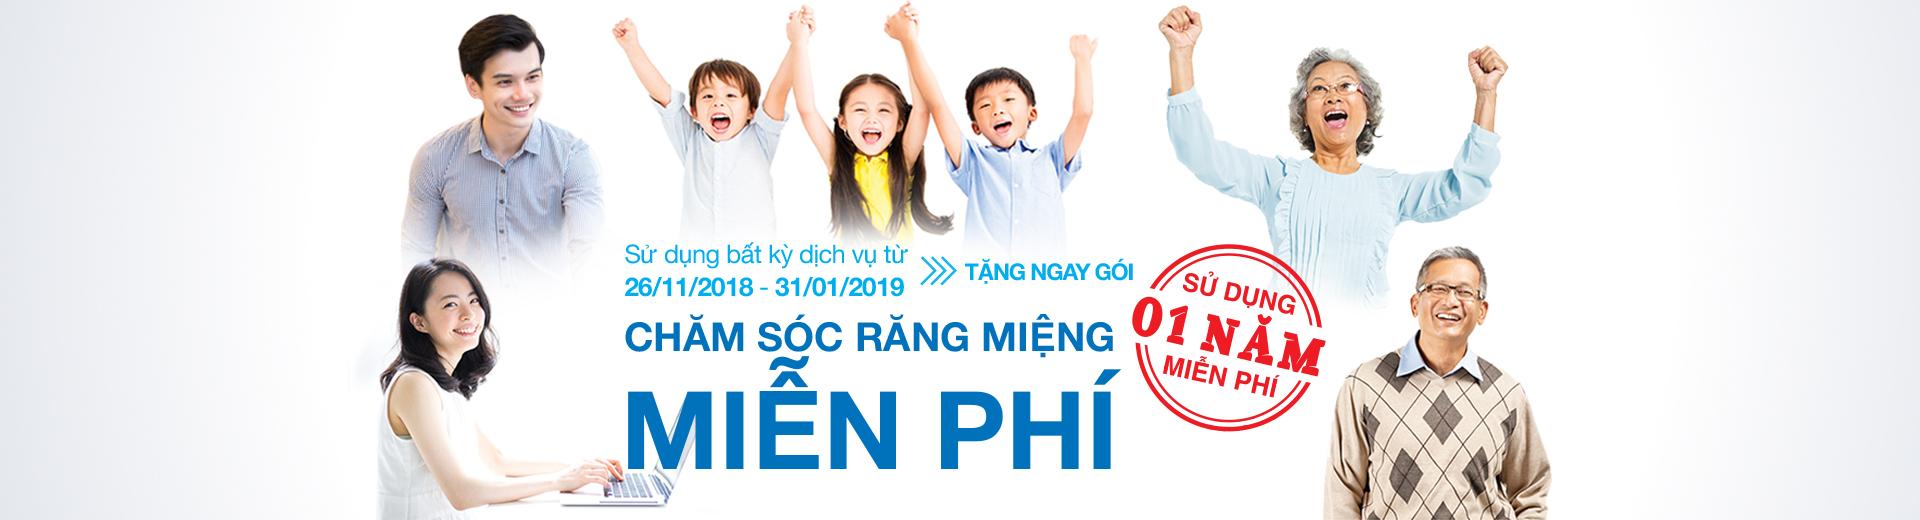 Banner Trang chủ 1